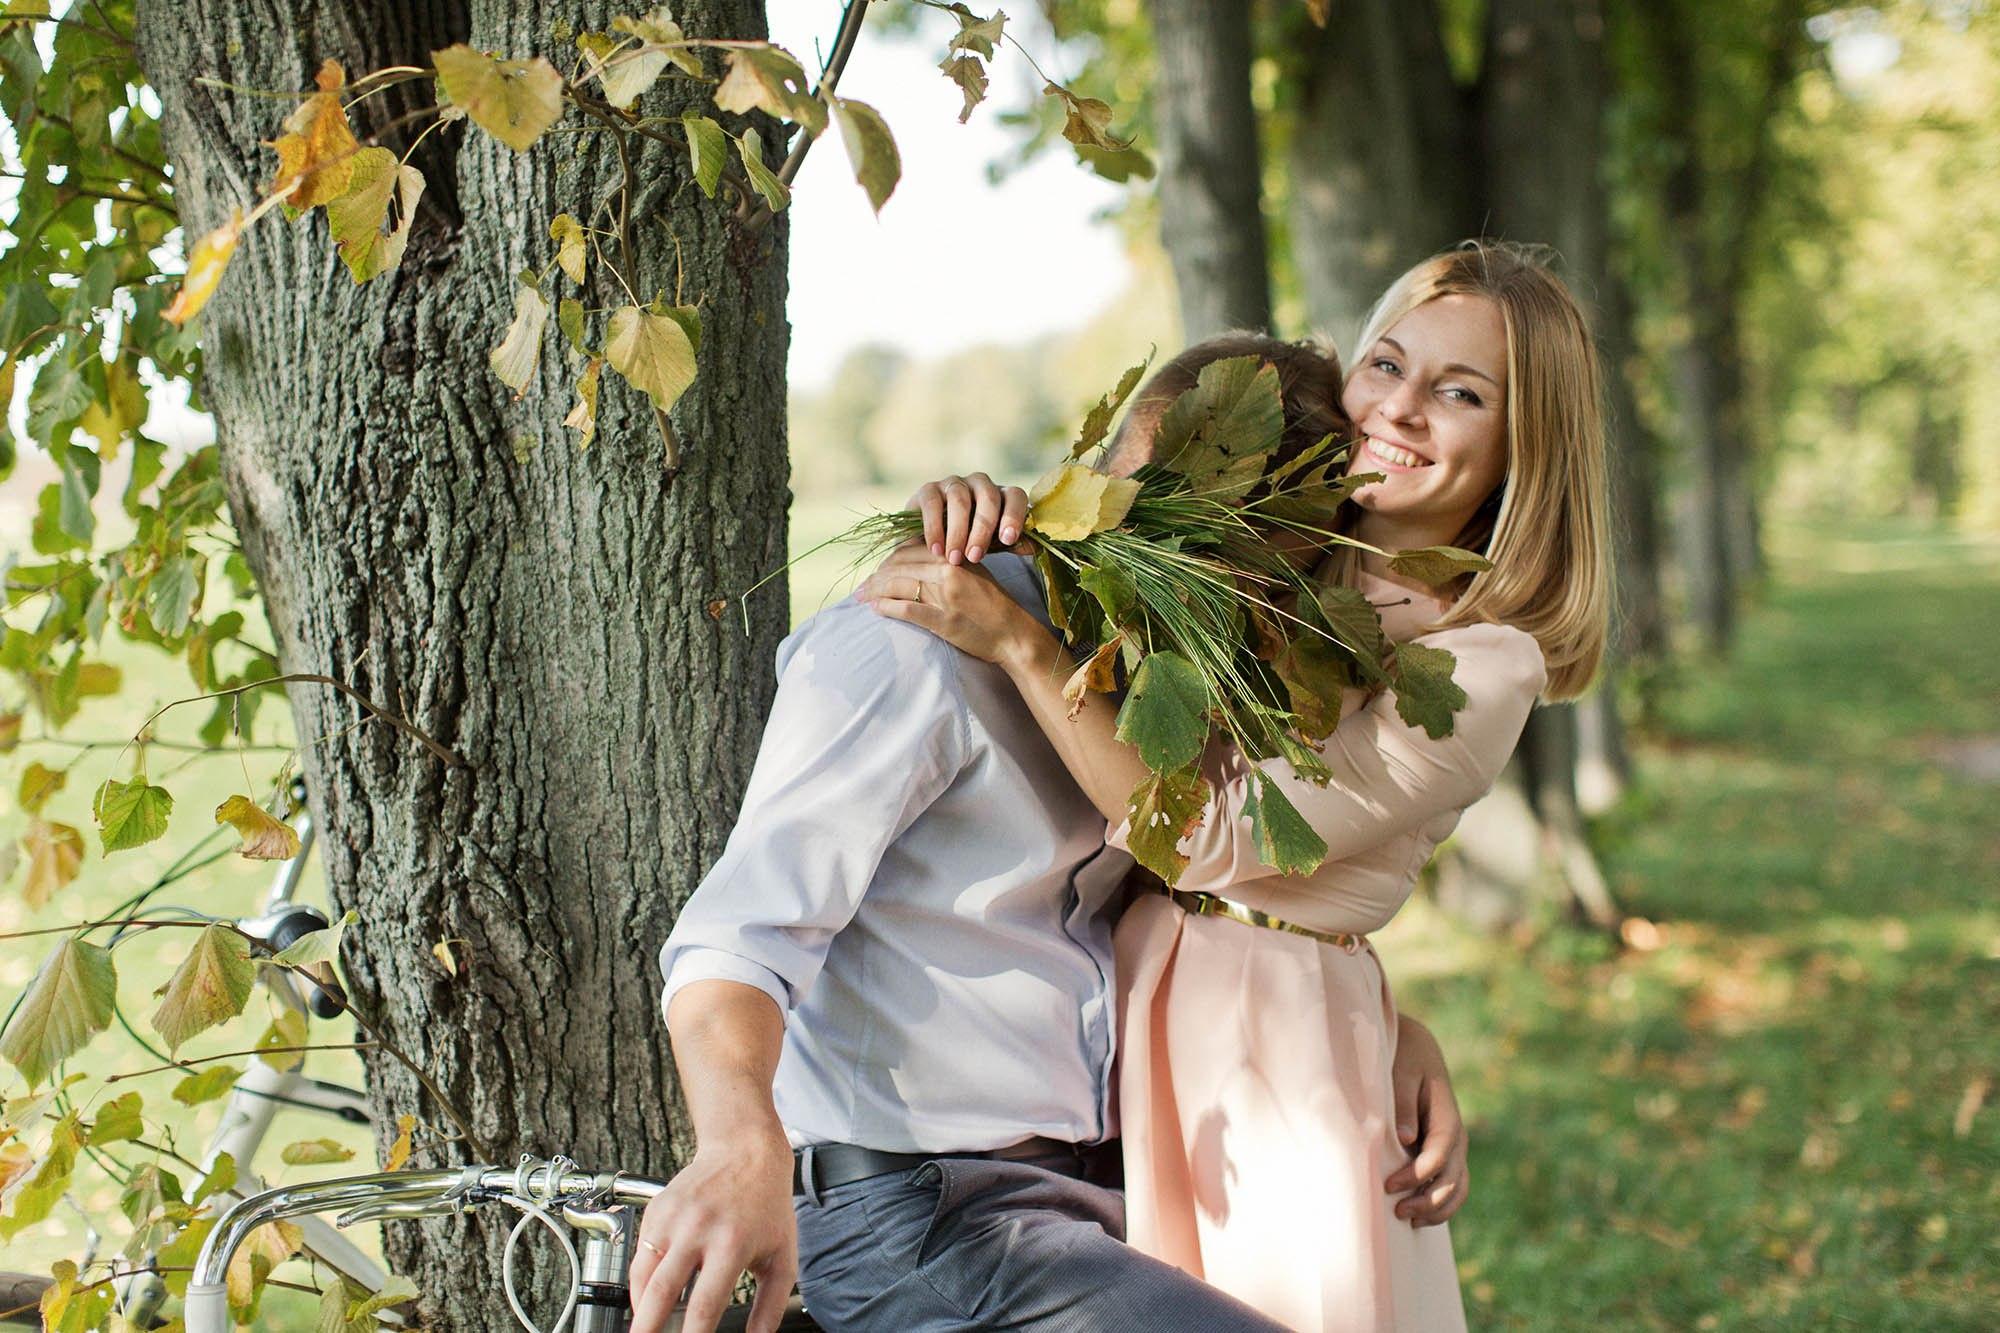 DNKqZFVAXUM - Посадить дерево на свадебной церемонии: детали сценария